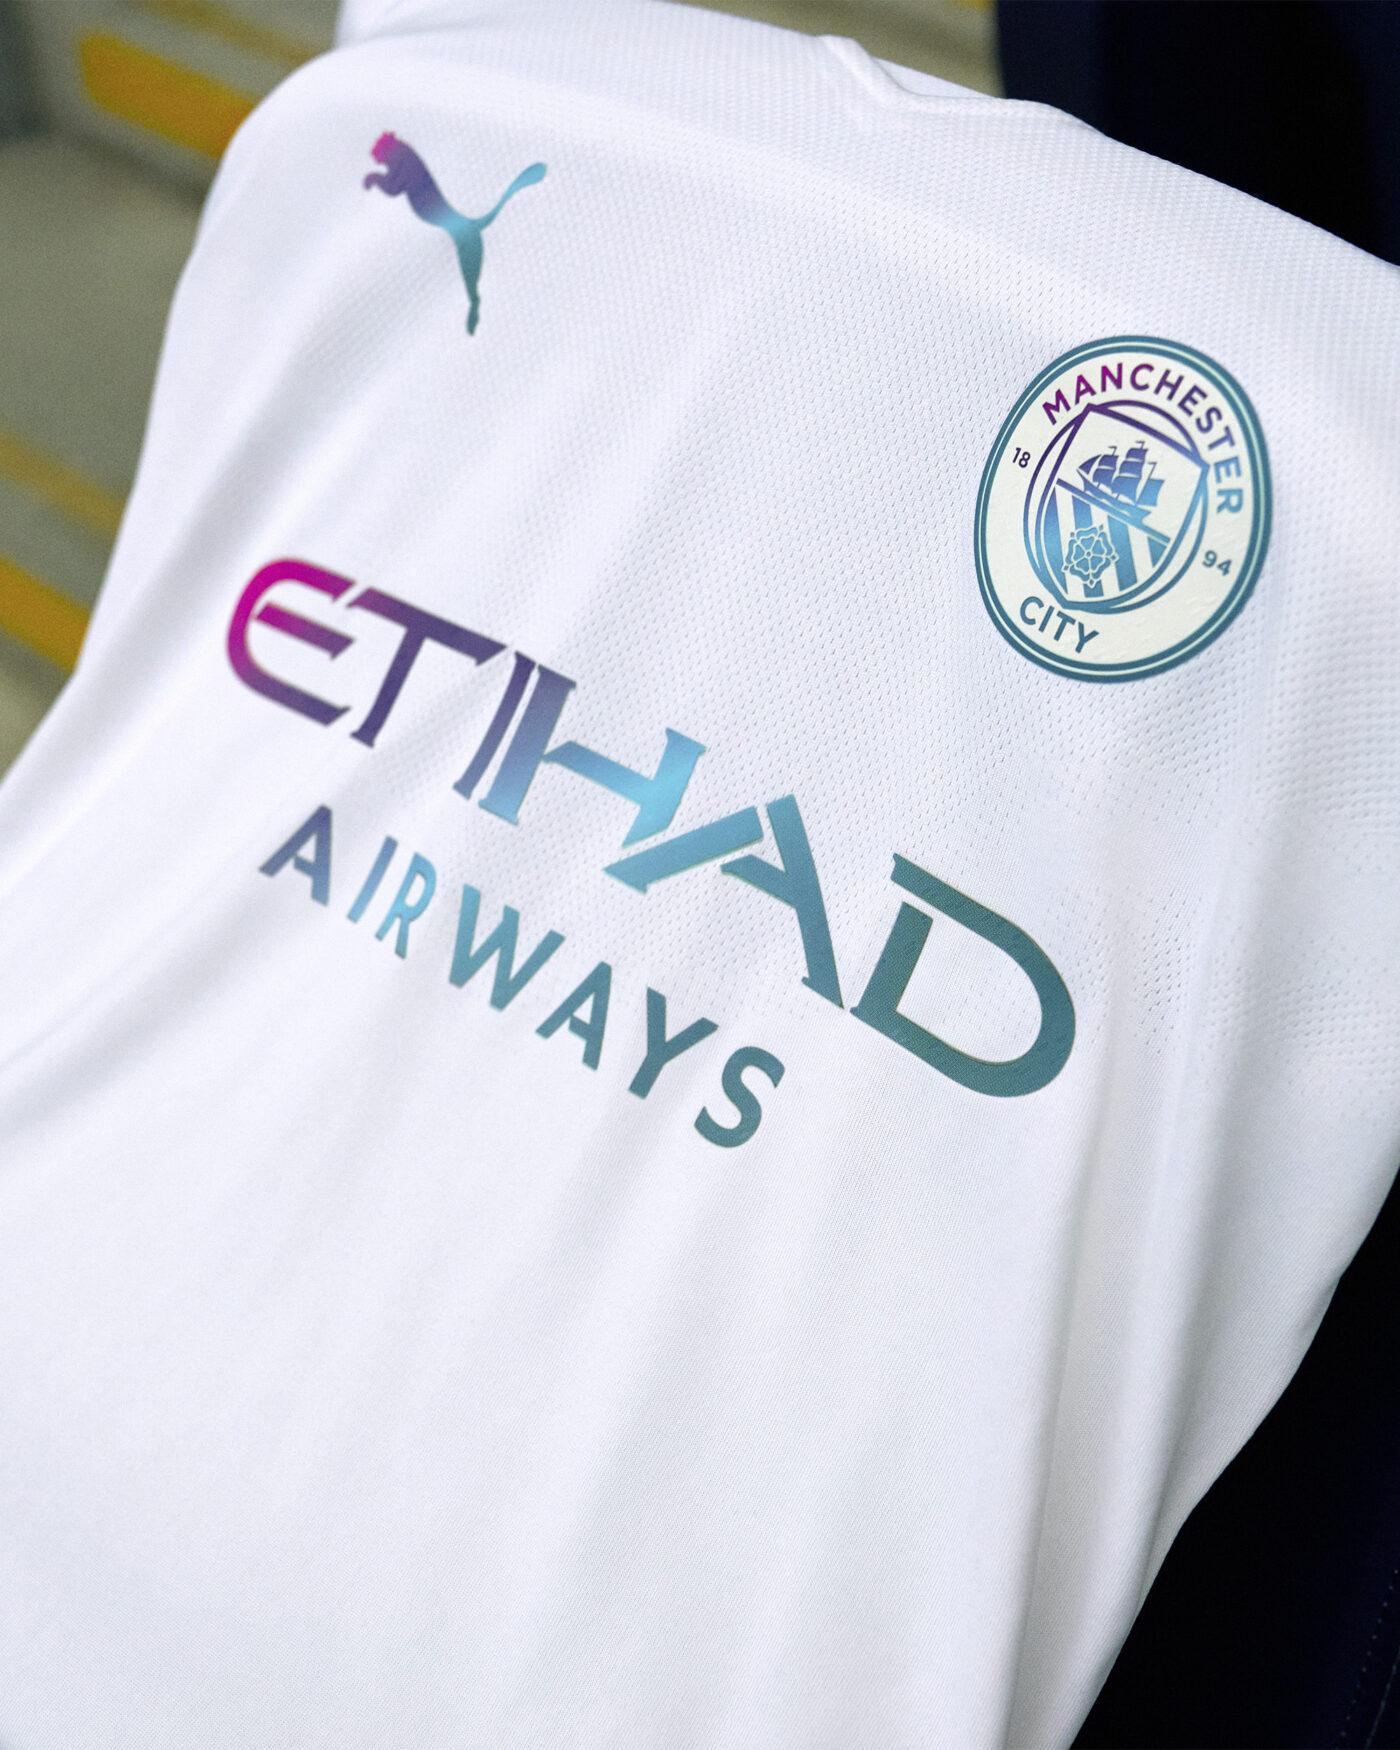 Maillot Manchester City 2021-2022 extérieur PUMA